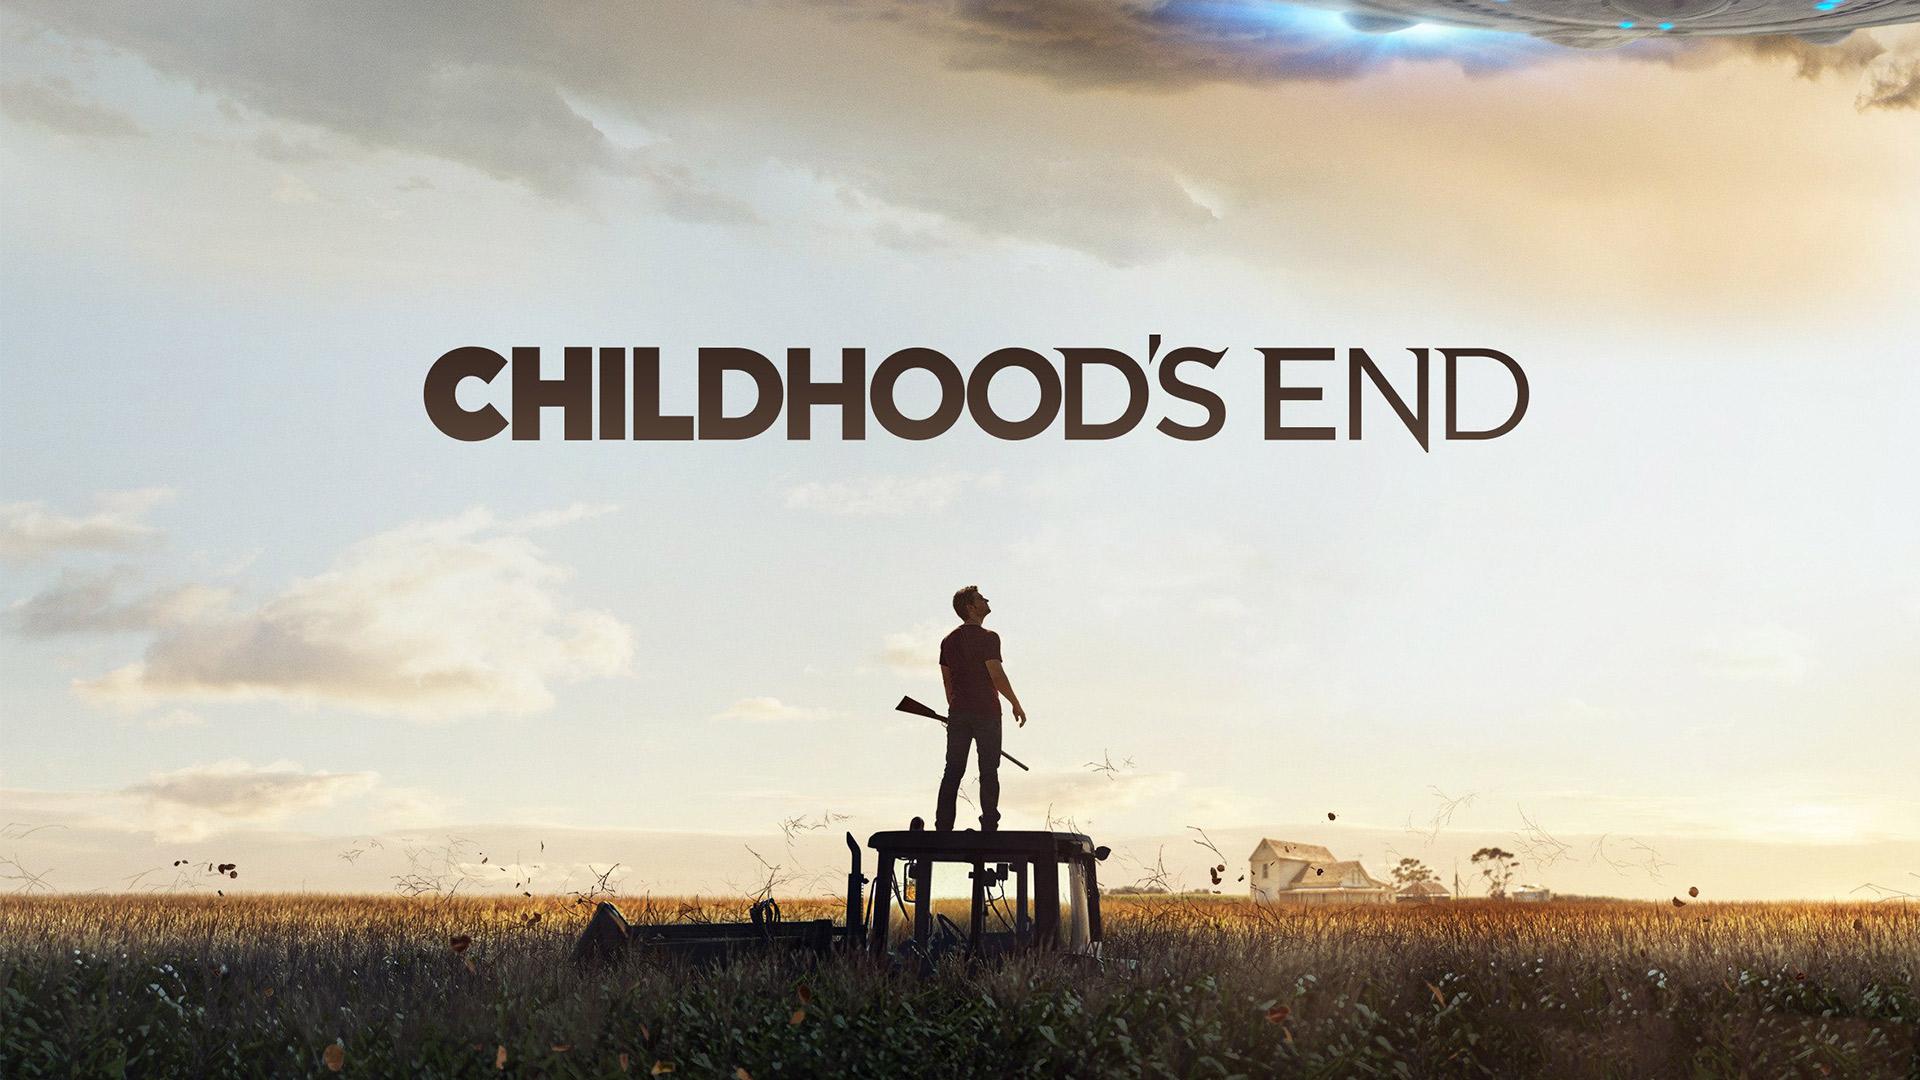 Childhood's End, Season 1